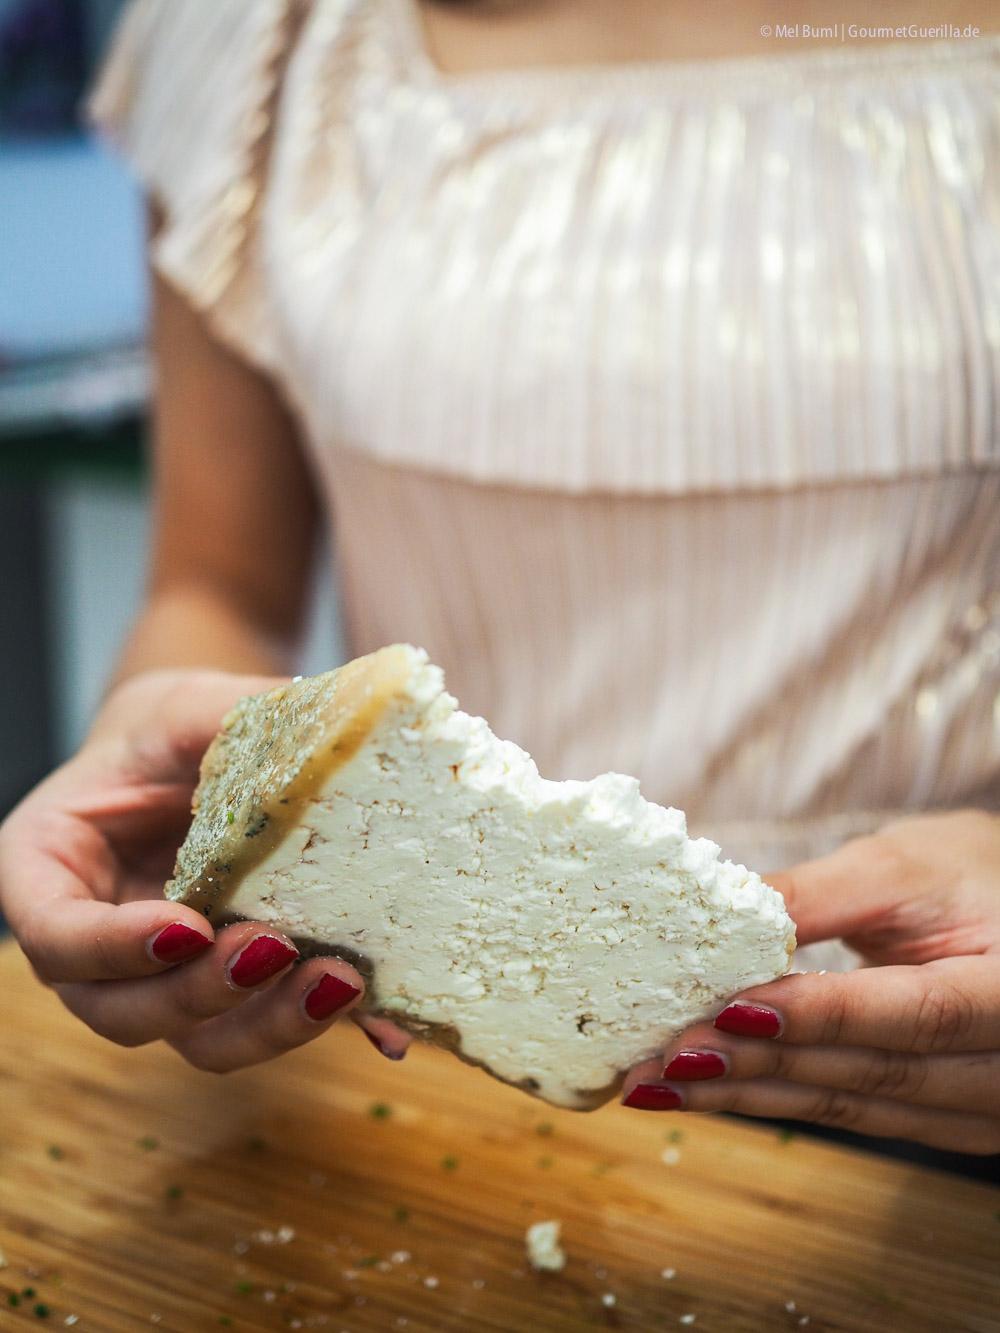 Kochschule Glücklich kochen Stumm Best of Zillertal |GourmetGuerilla.de